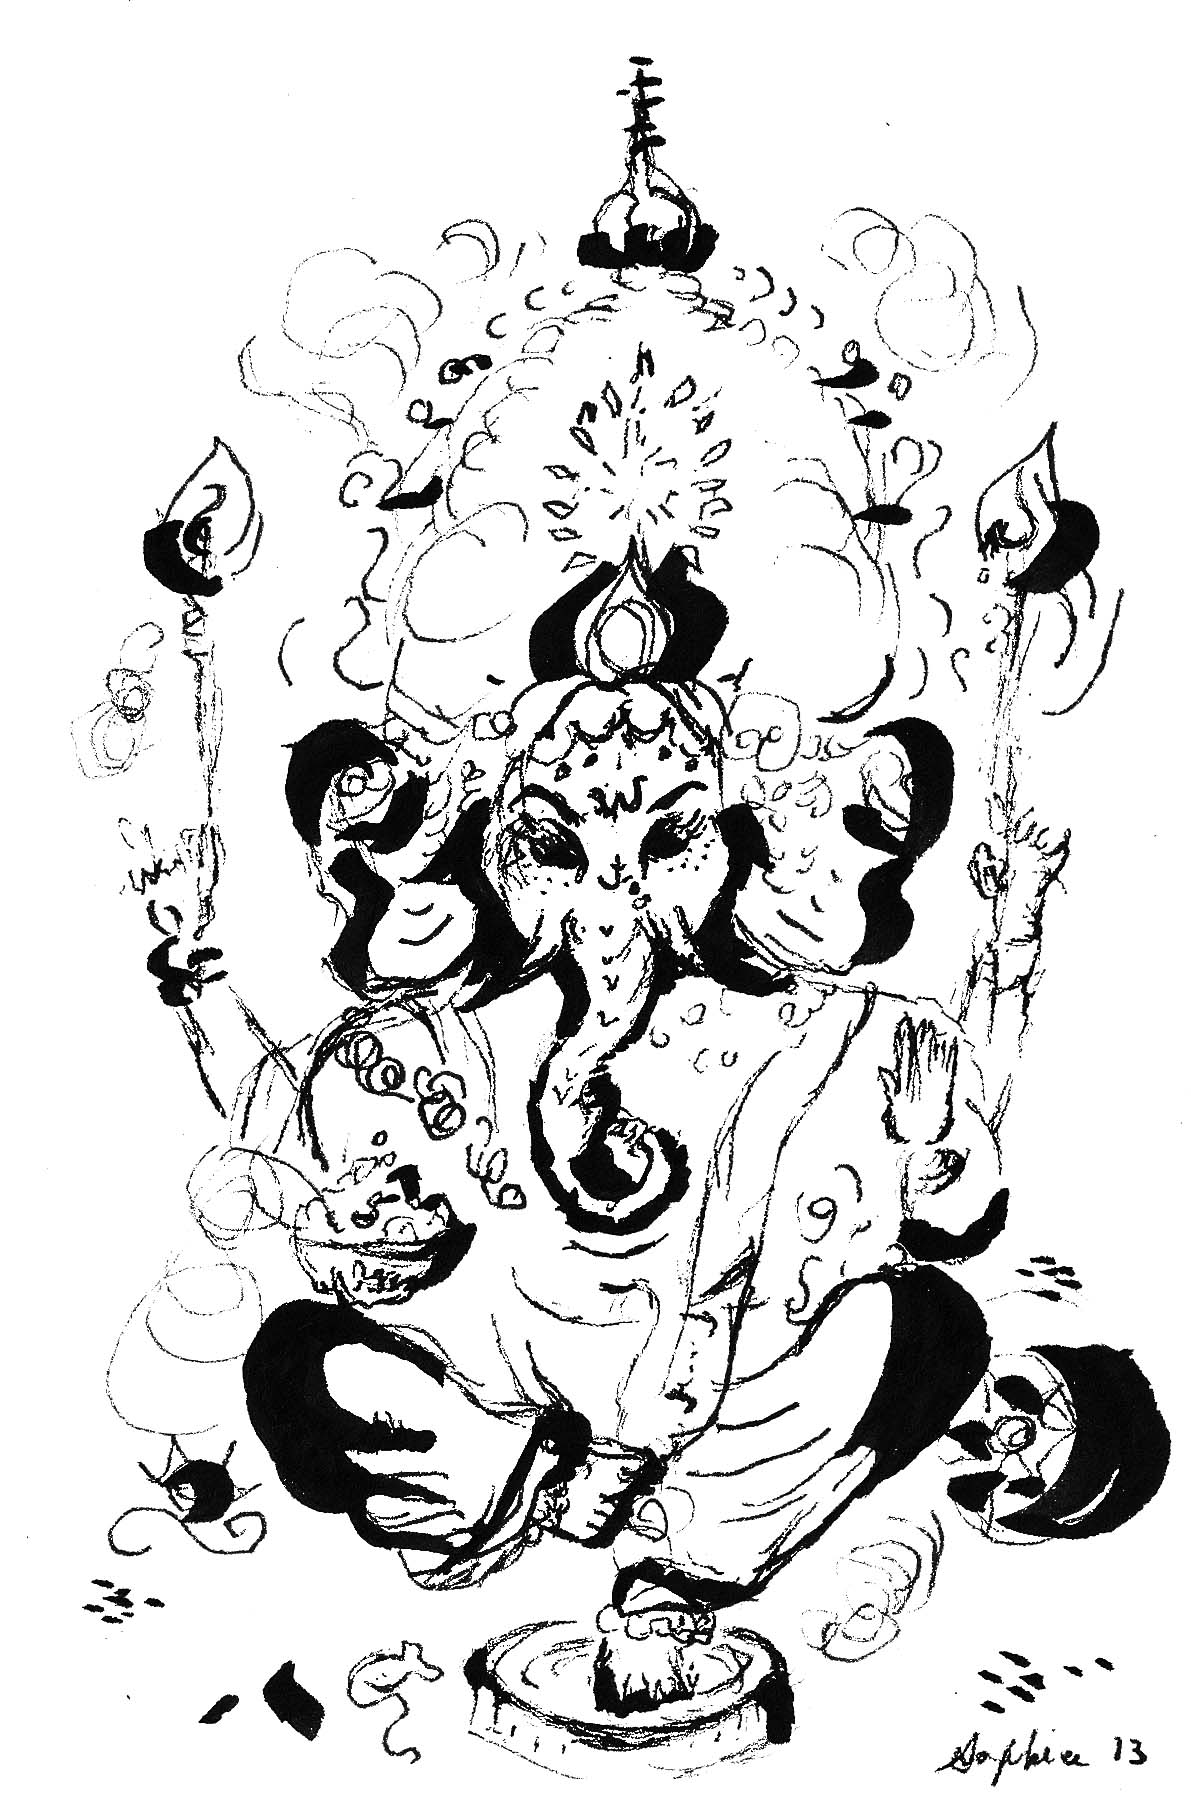 Ganesh in Ink